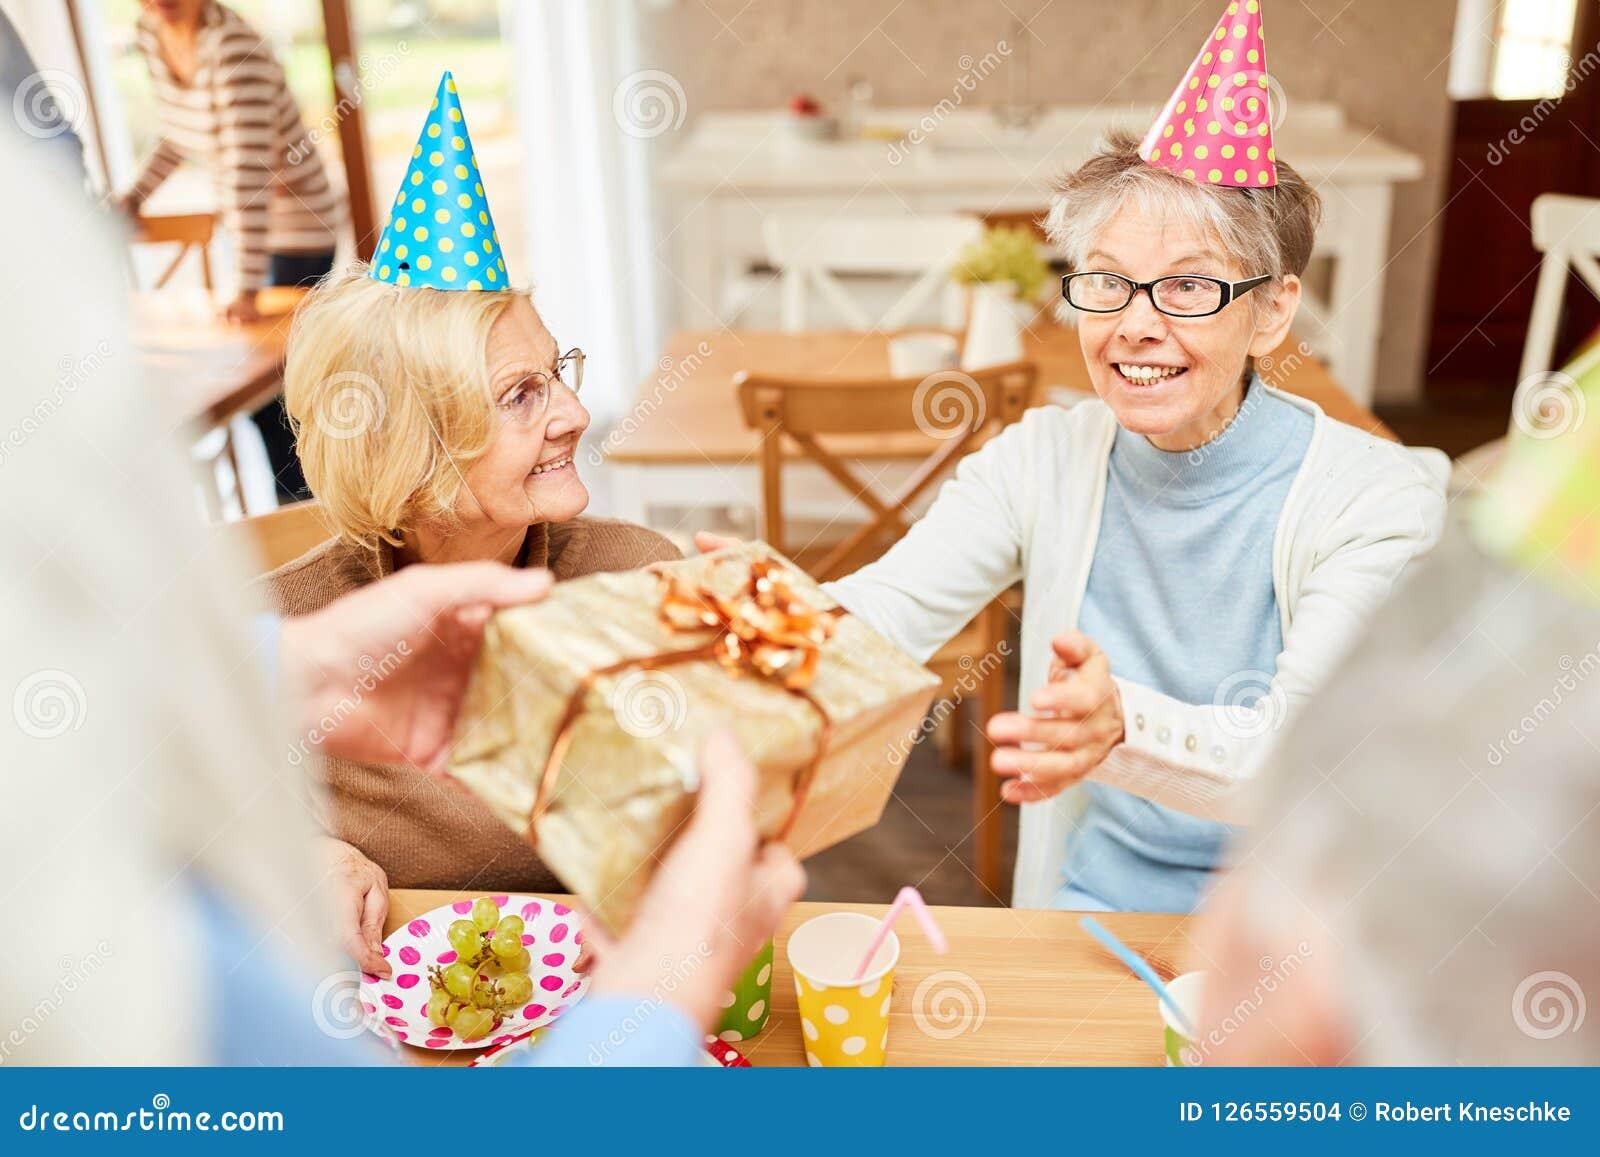 Senior woman as a birthday girl is happy